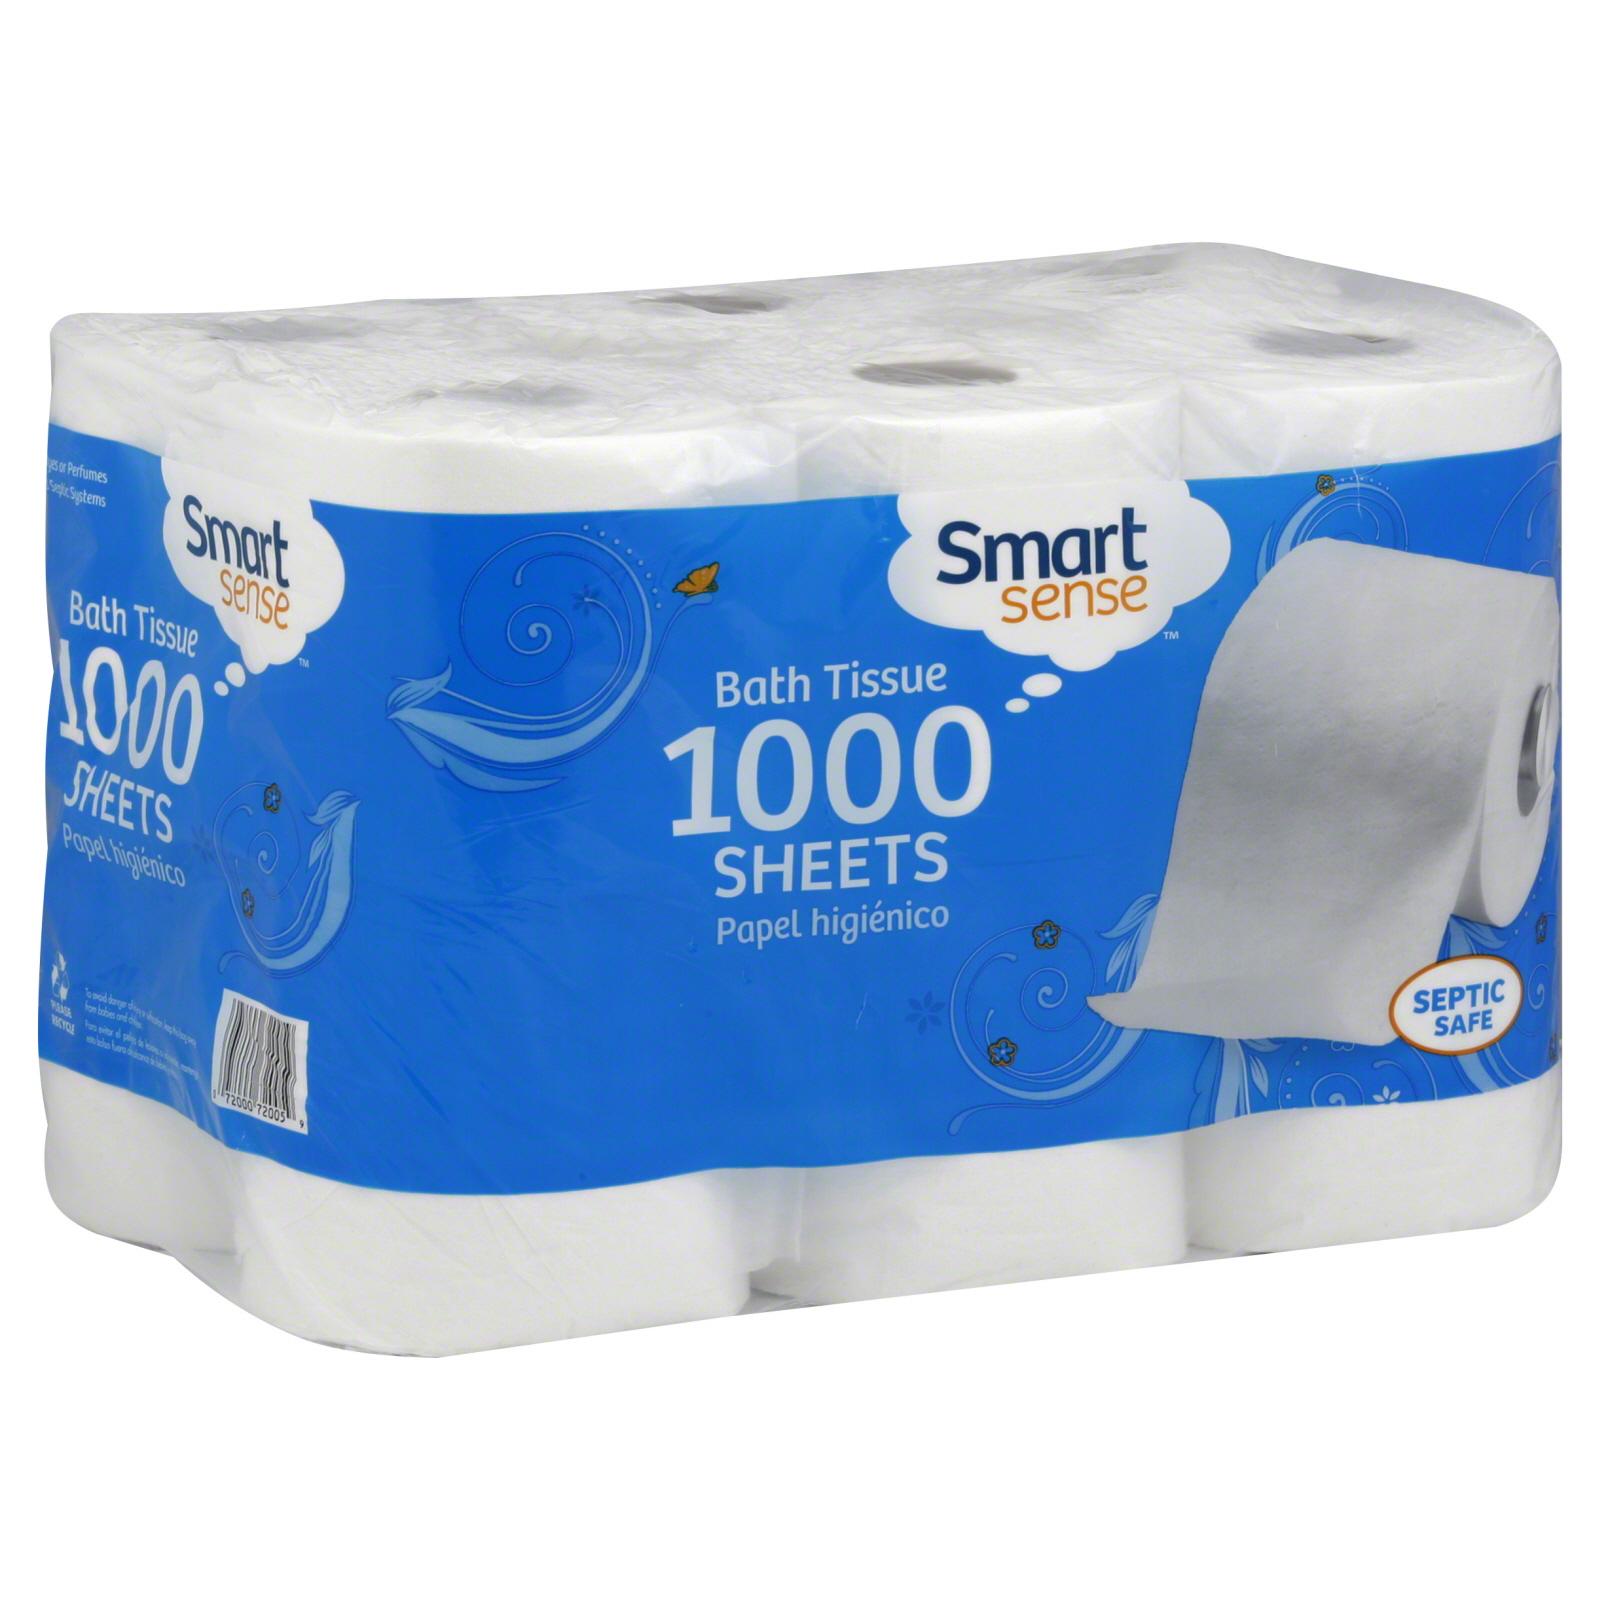 Smart Sense Bath Tissue, 1-Ply, 12 rolls